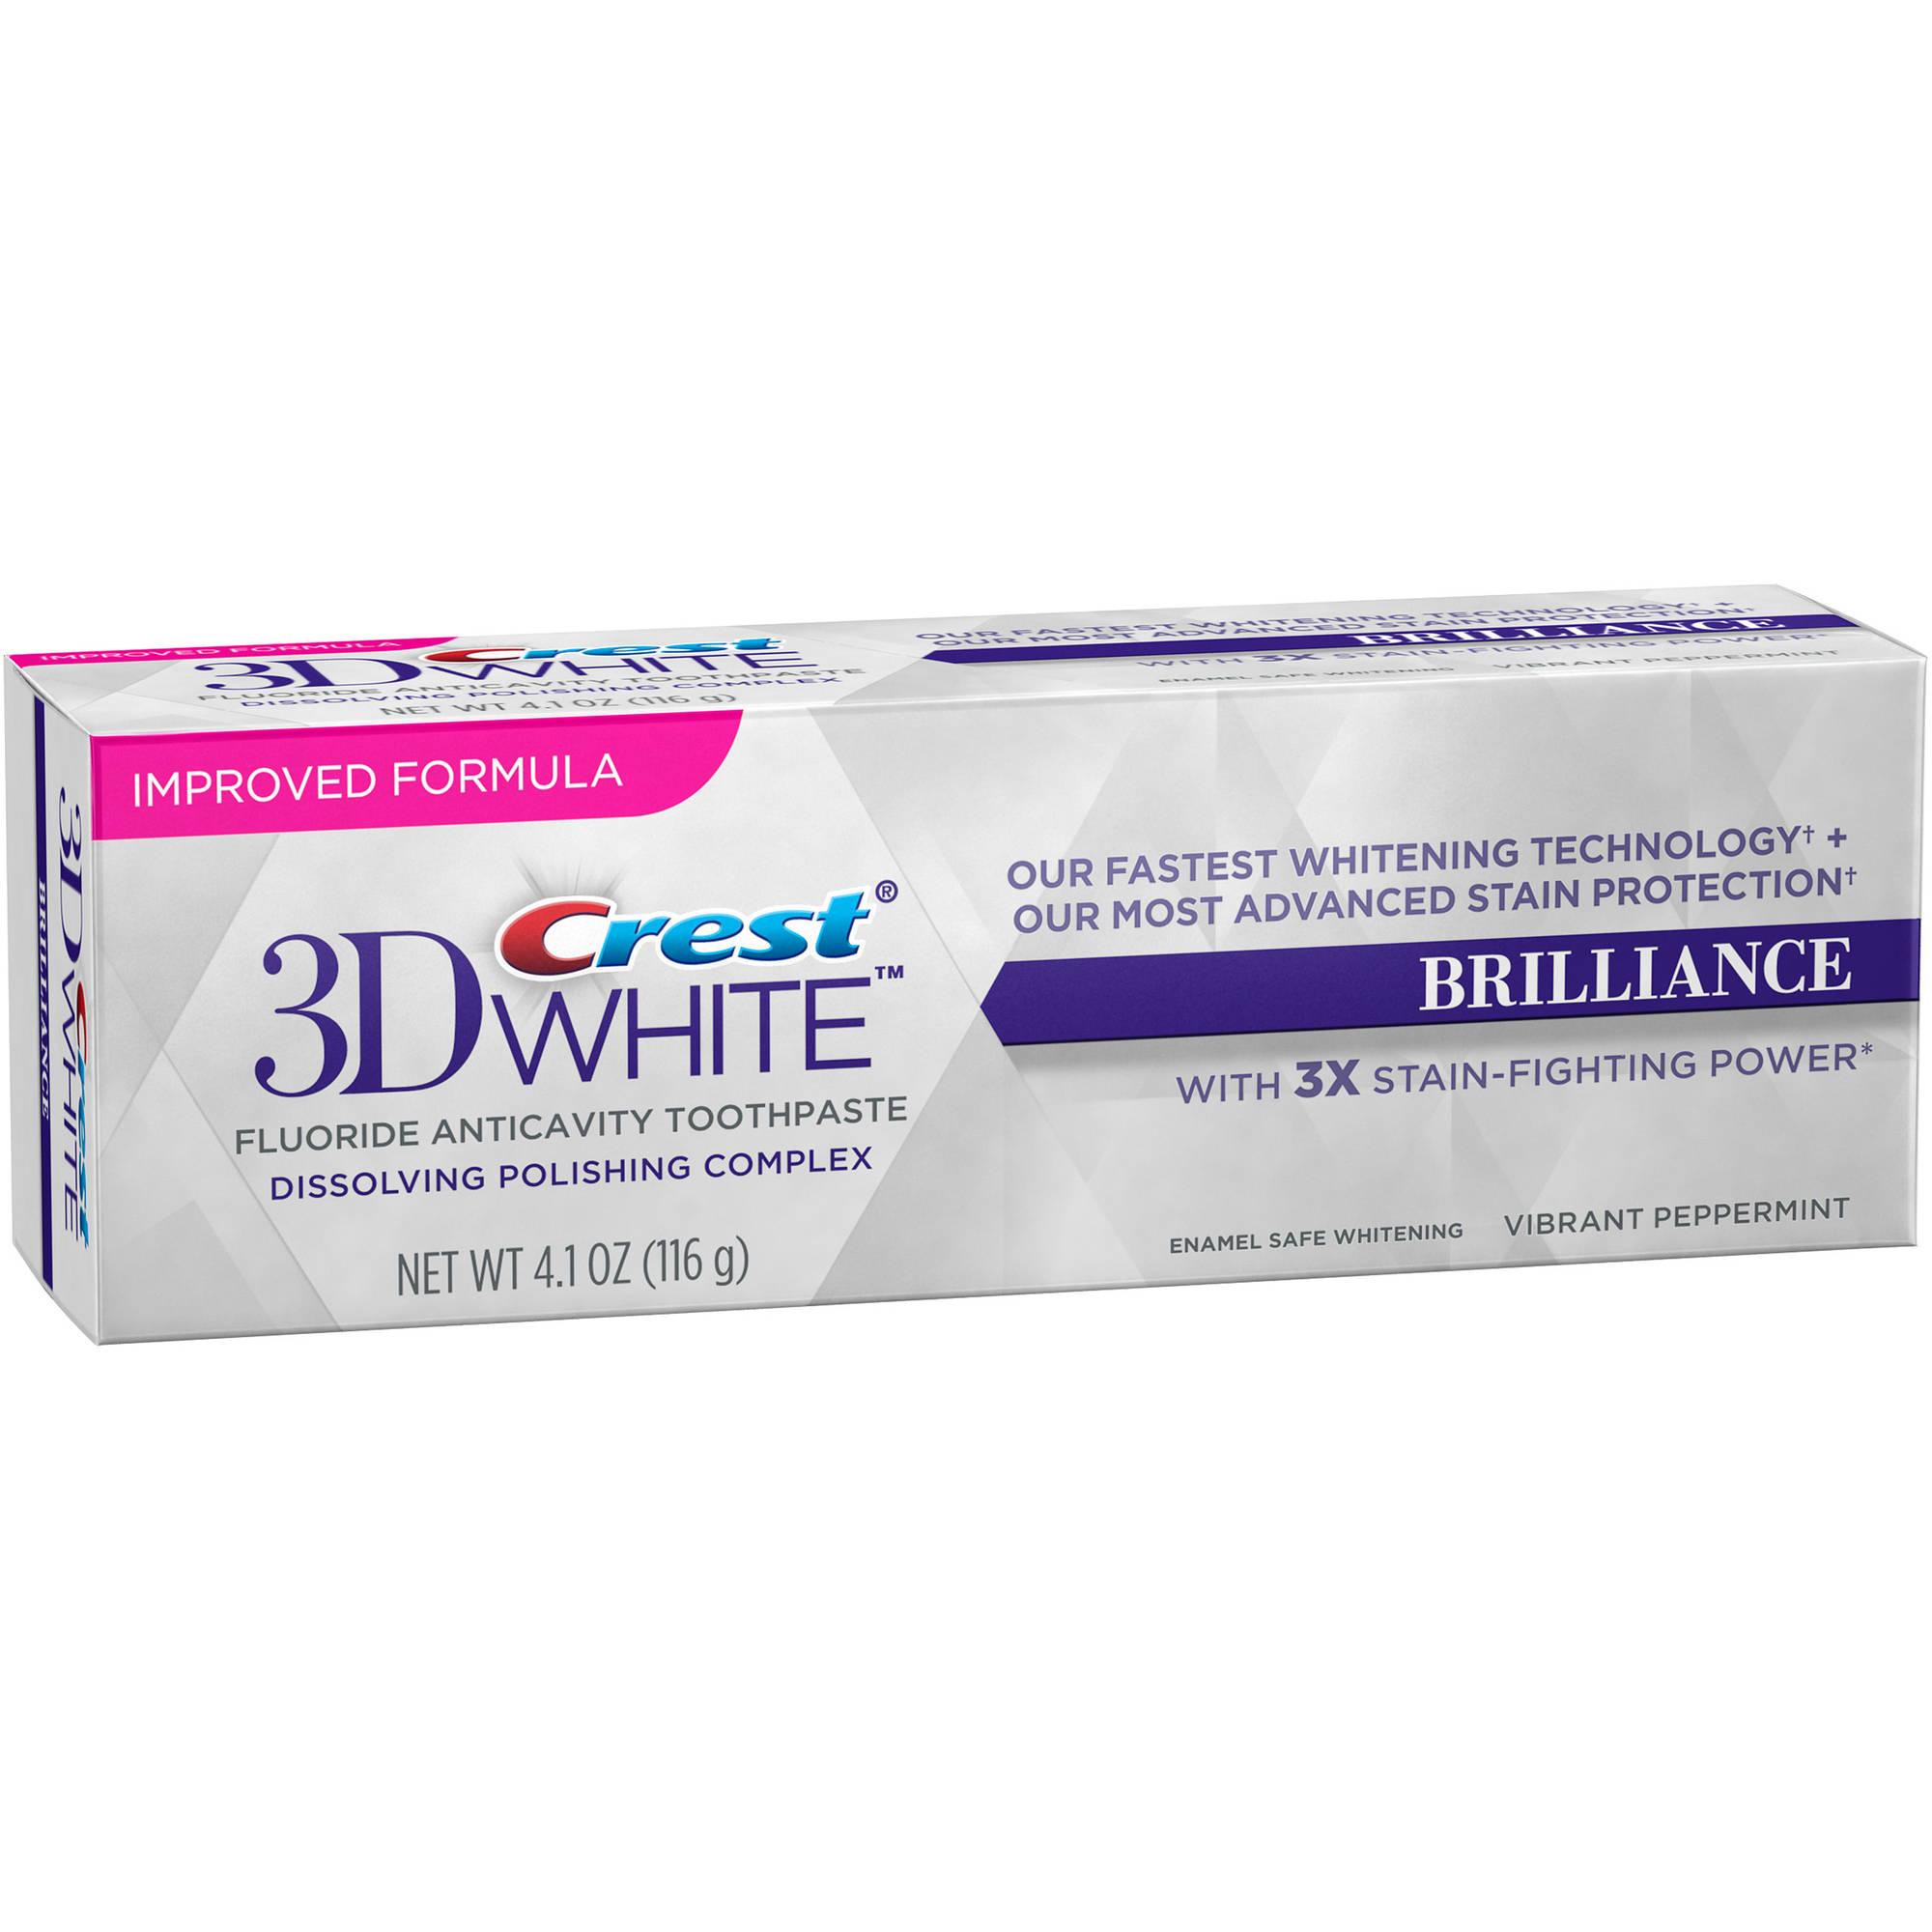 Crest Toothpaste 3d White Crest 3D White Brillia...